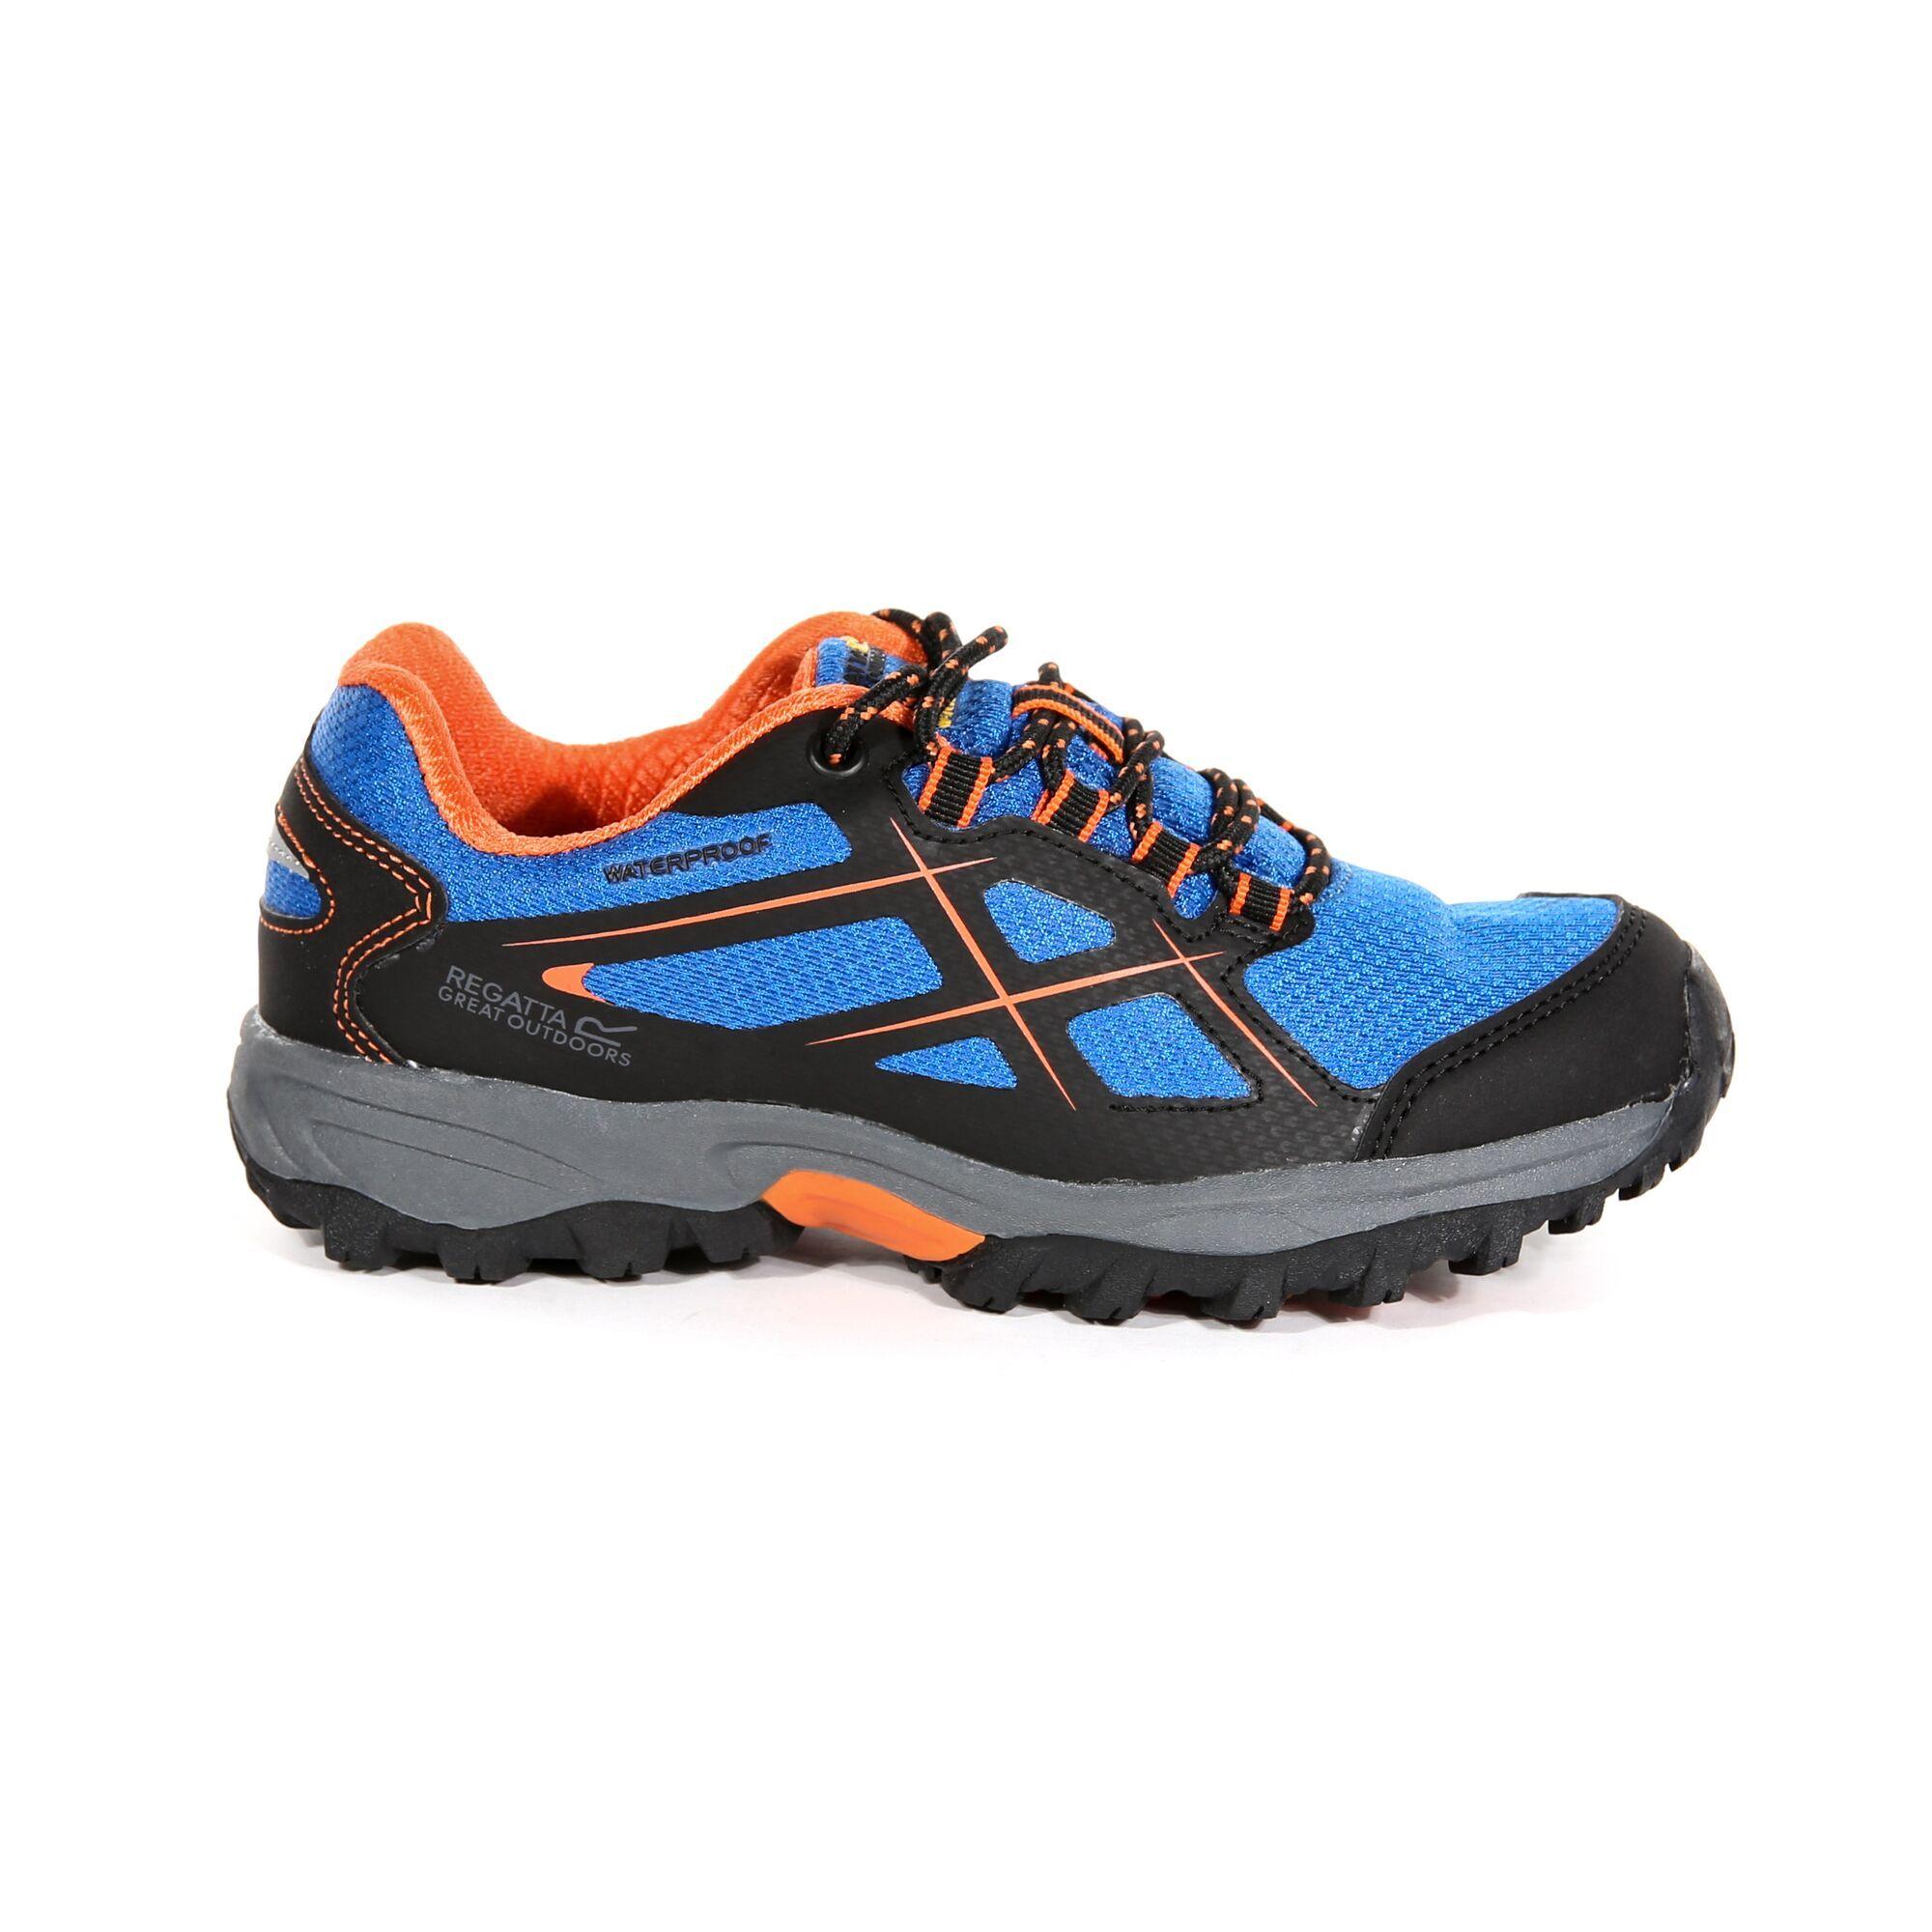 Regatta Childrens/Kids Kota Low Junior Walking Shoes